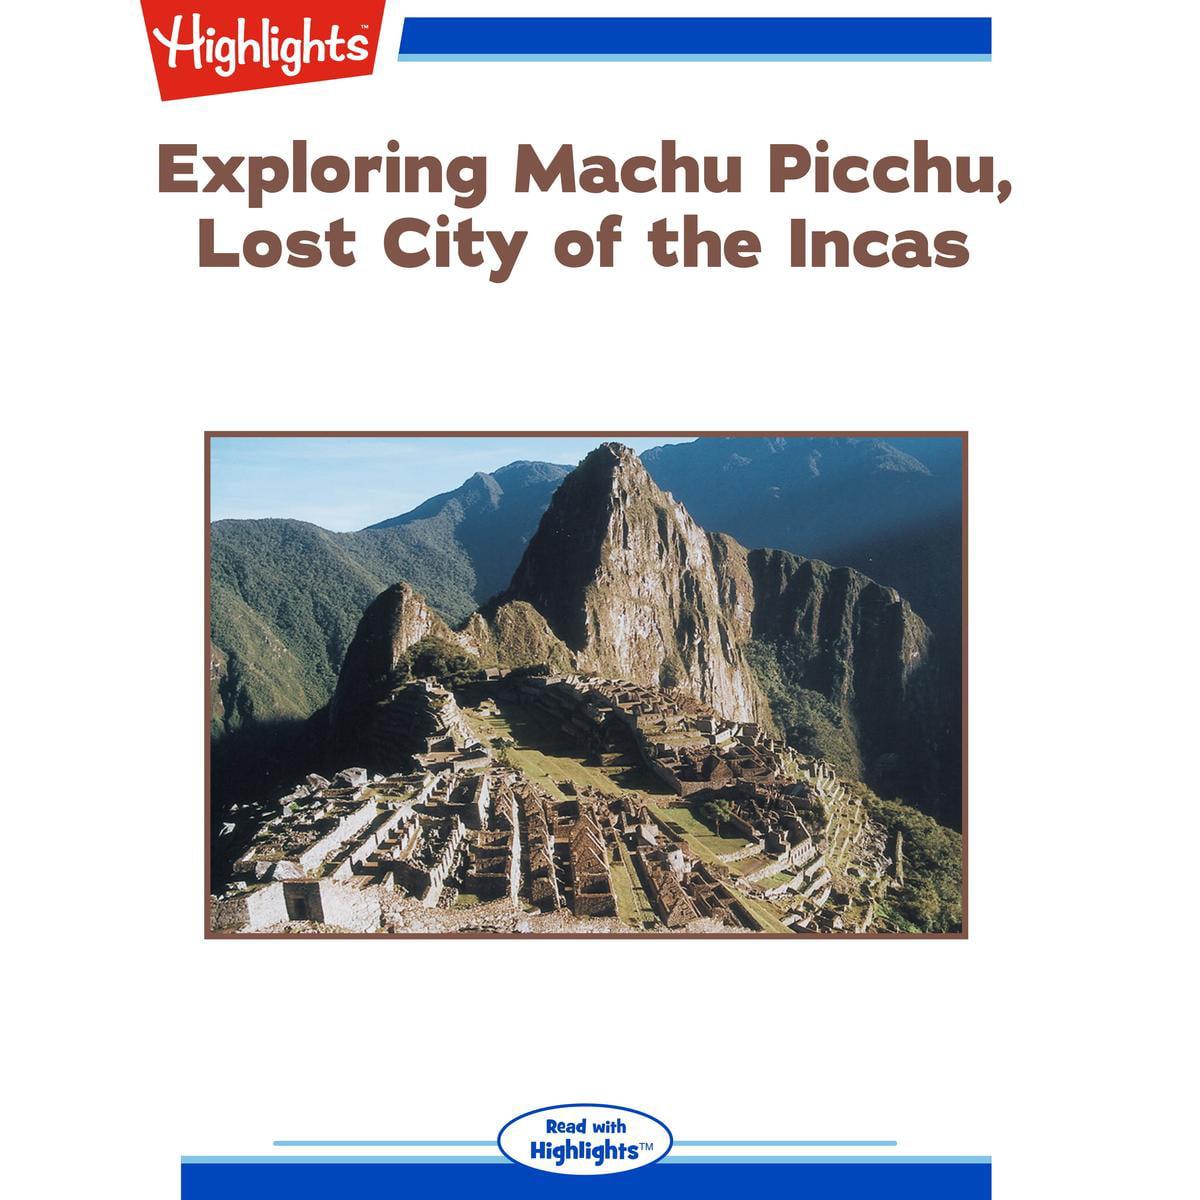 Exploring Machu Picchu, Lost City of the Incas - Audiobook